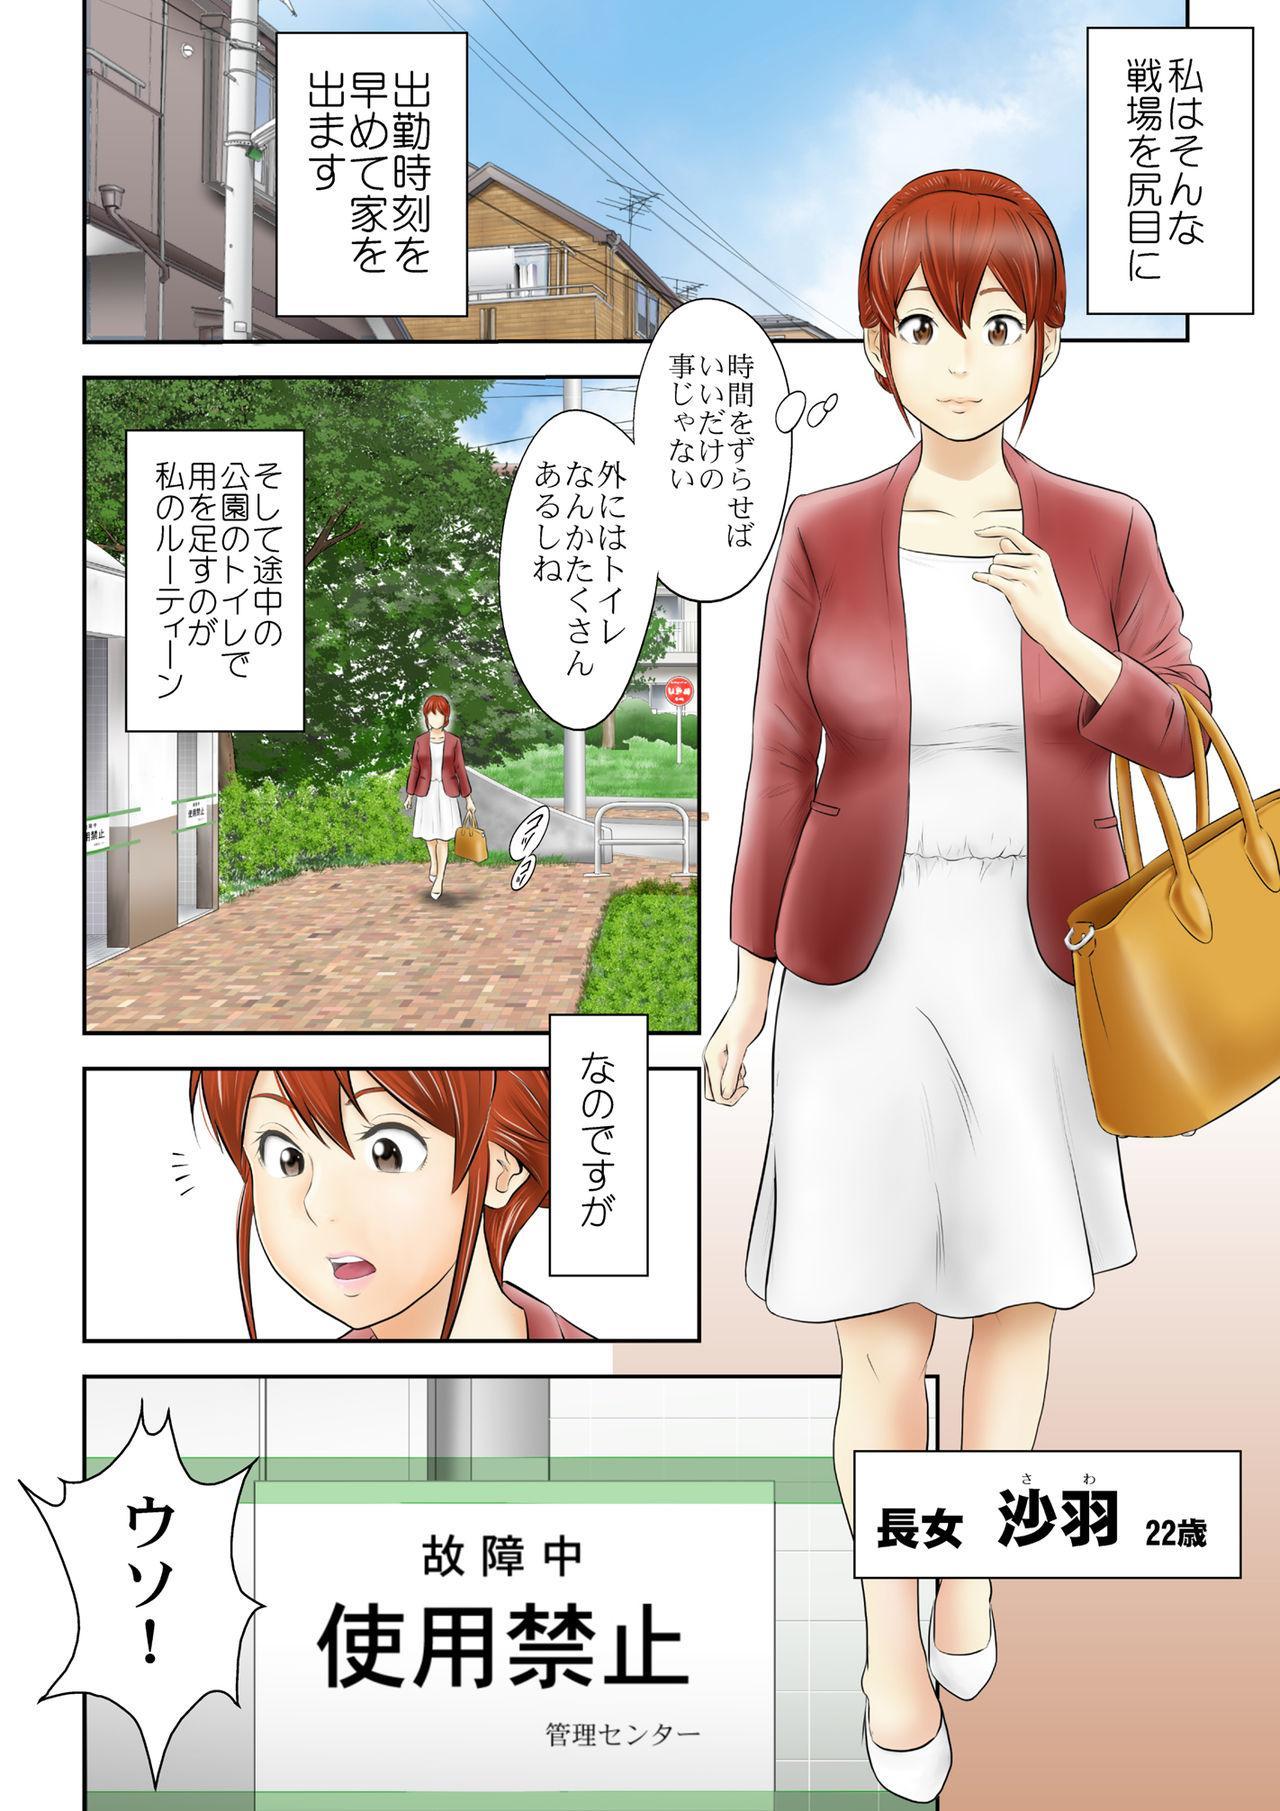 [GOLD DUST (Tange Suzuki)] Ichigotani-ka no Onna-tachi - ICHIGOTANI family girls [Digital] 7